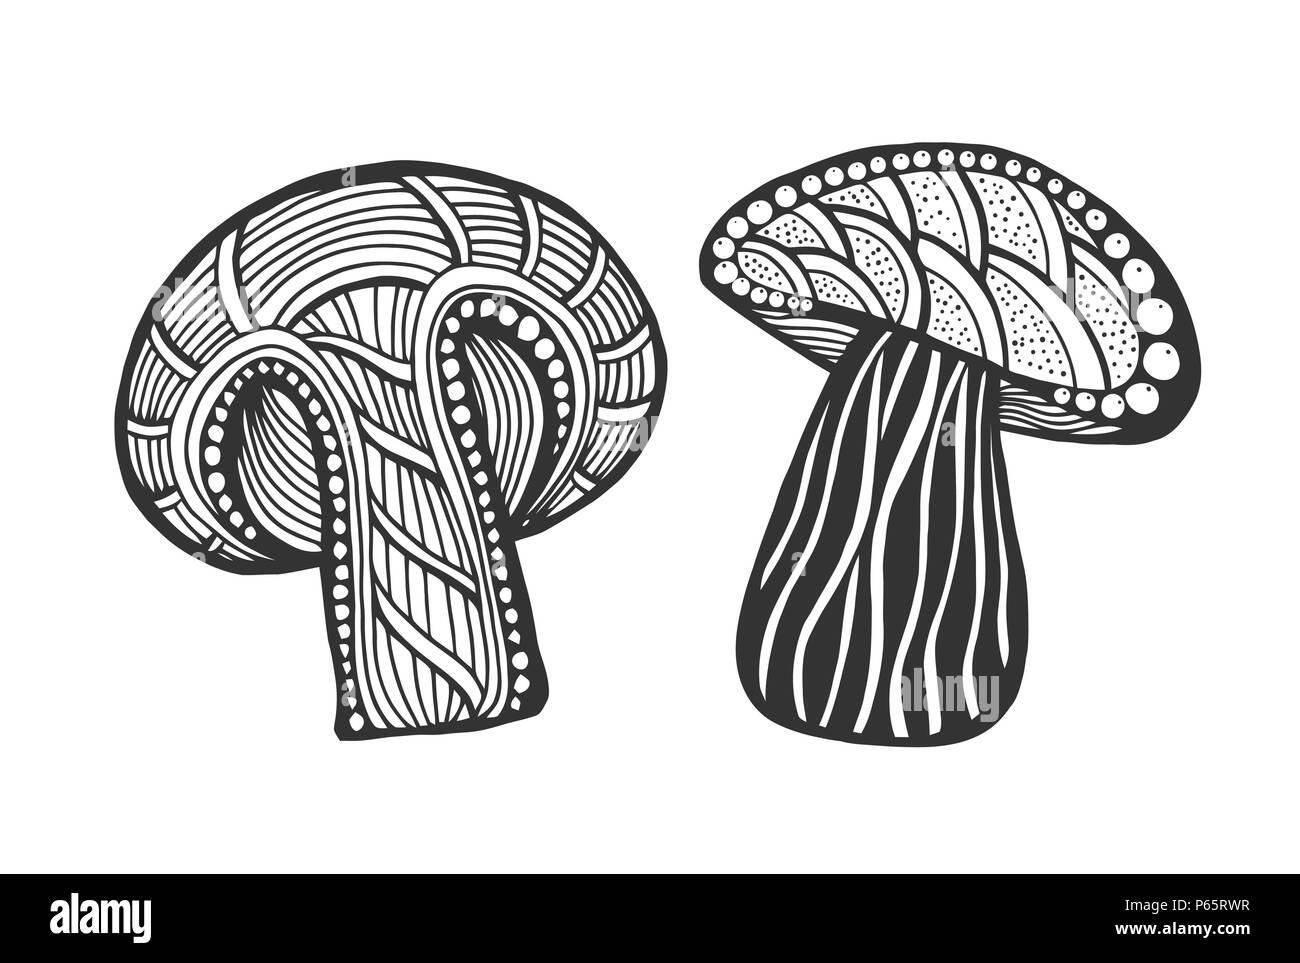 Magic Mushroom Black And White Stock Photos Images Alamy